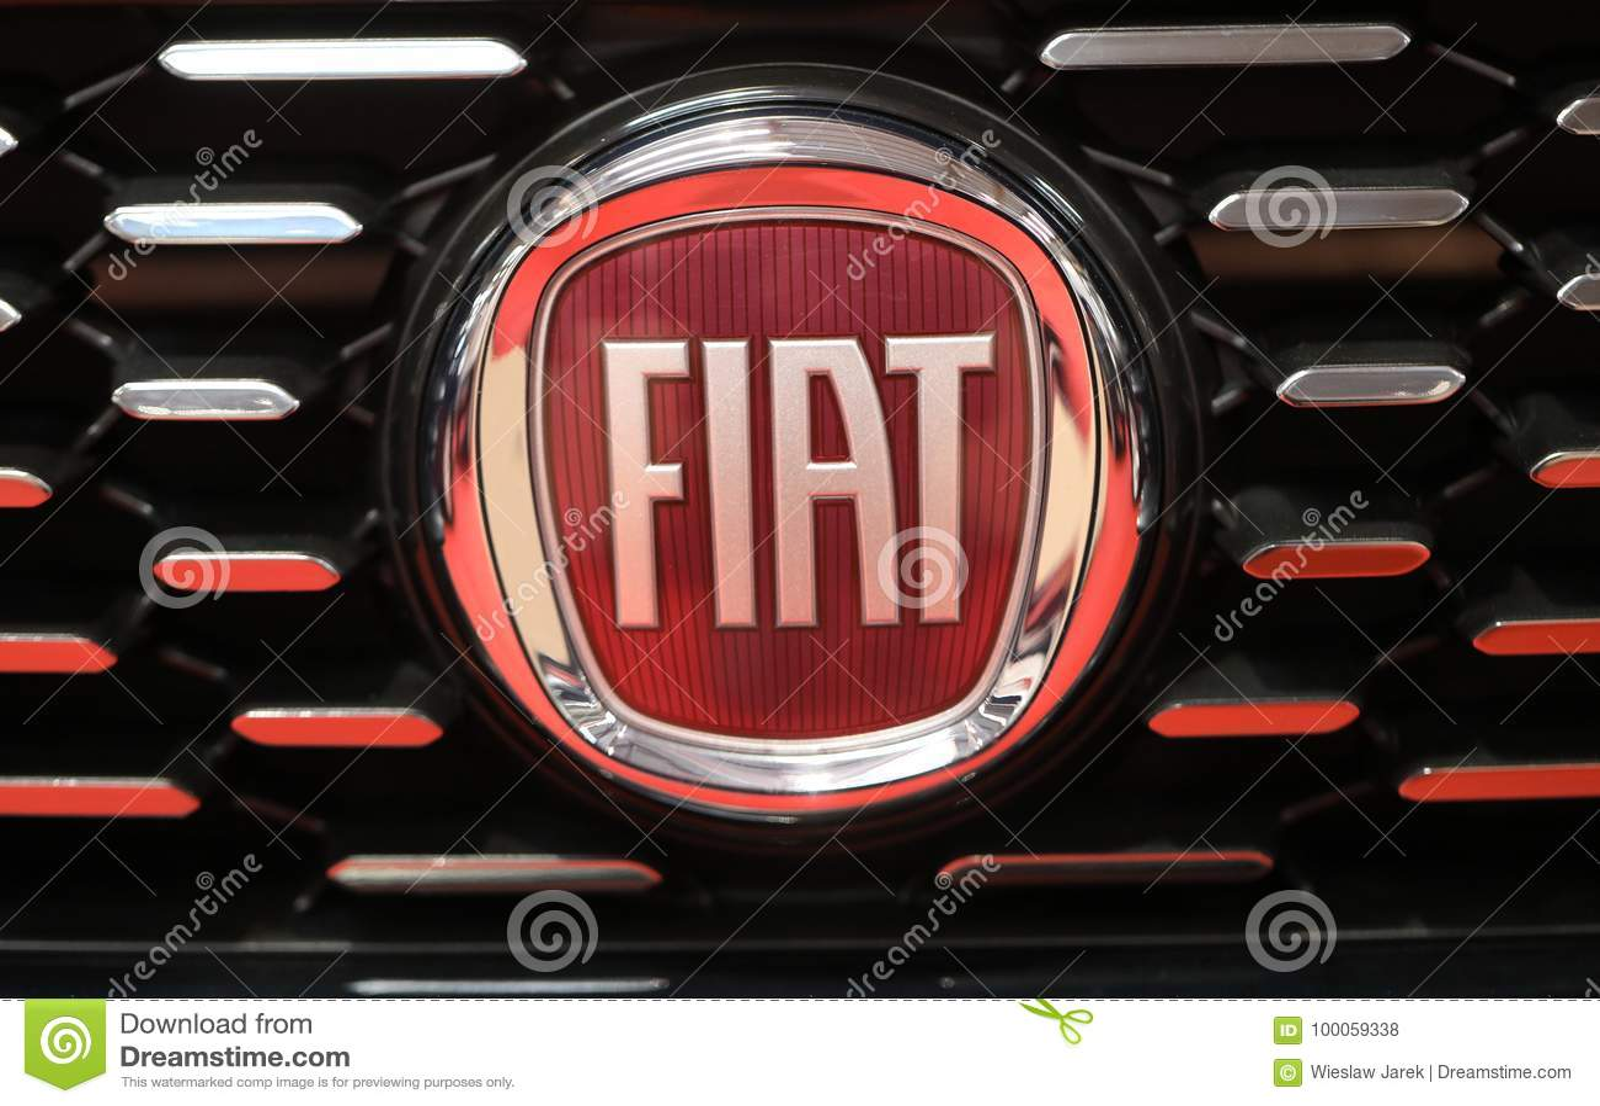 Fiat Metallic Logo Closeup On Fiat Car Displayed At Moto Show In